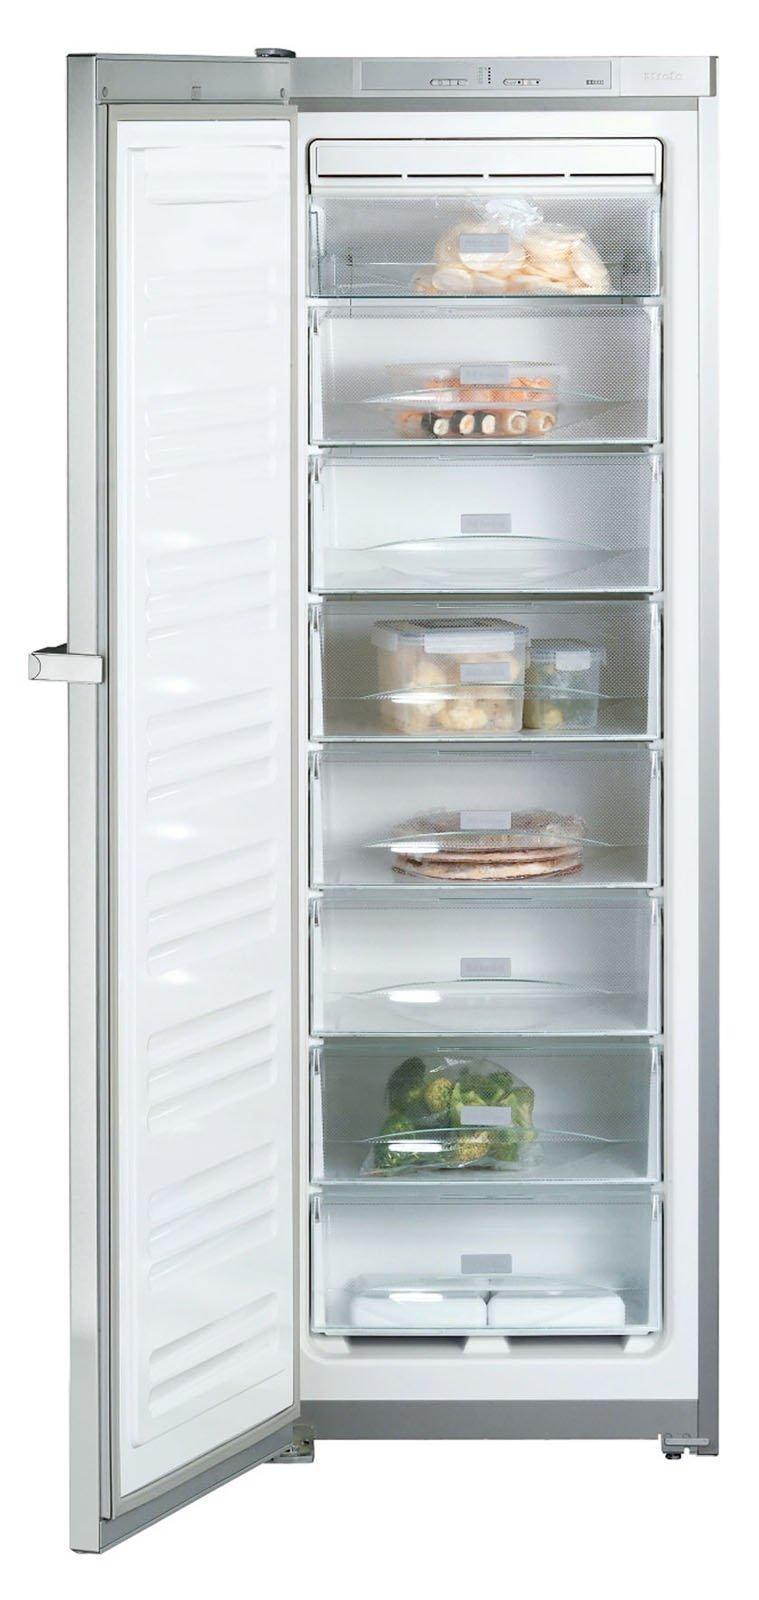 Congelatori, da affiancare al frigo - Cose di Casa